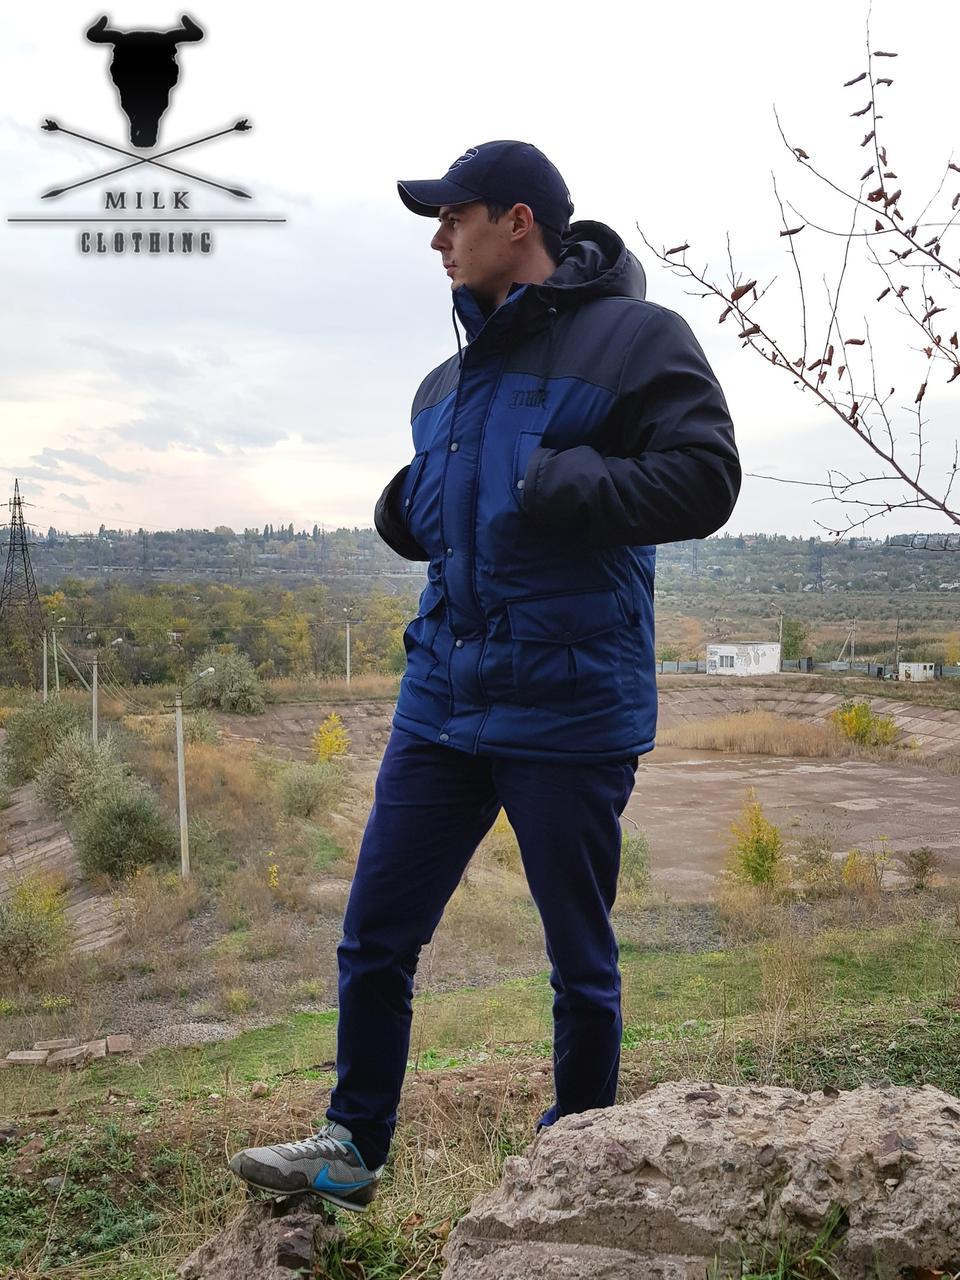 Зимняя парка\куртка Milk Clothing - Classic Black/Navy (мужская) Зима Теплая